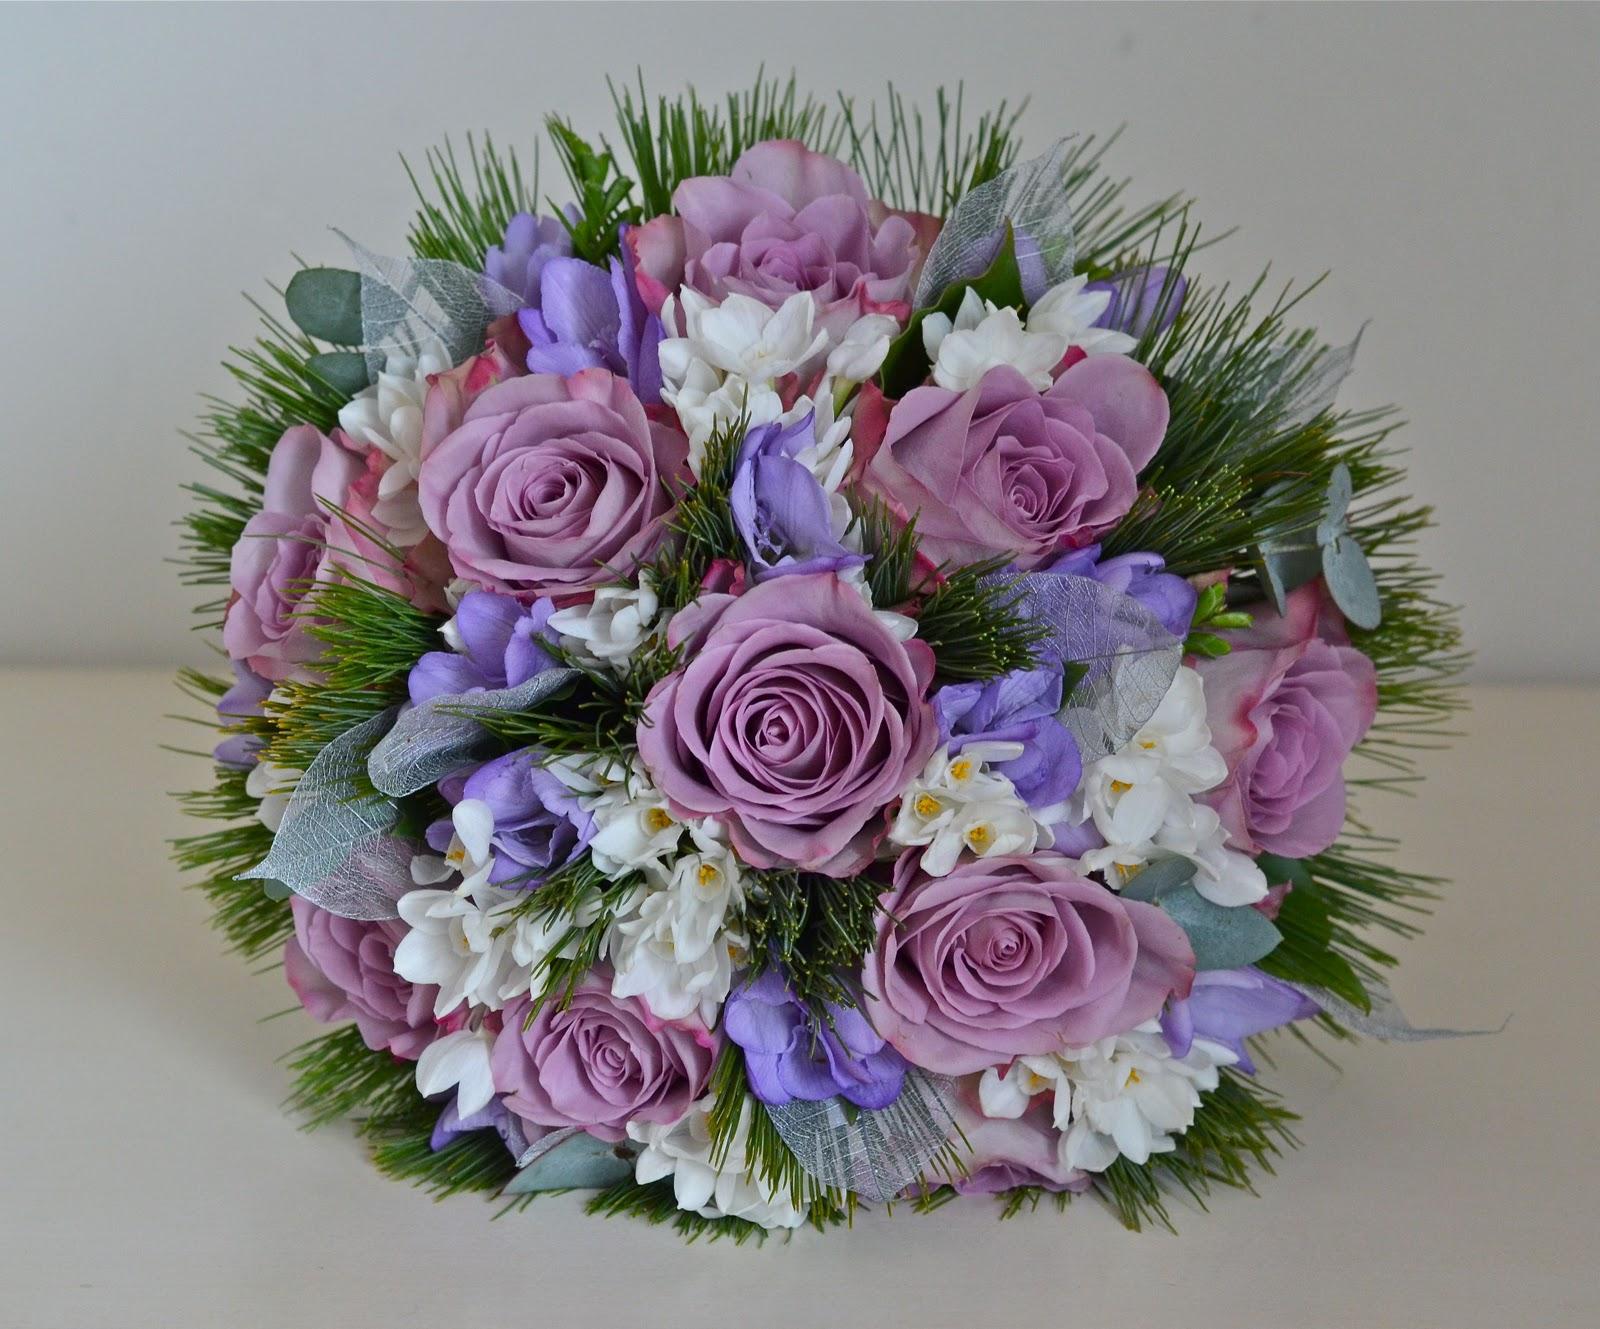 Wedding Flowers Blog: Lucy's Christmas Wedding Flowers